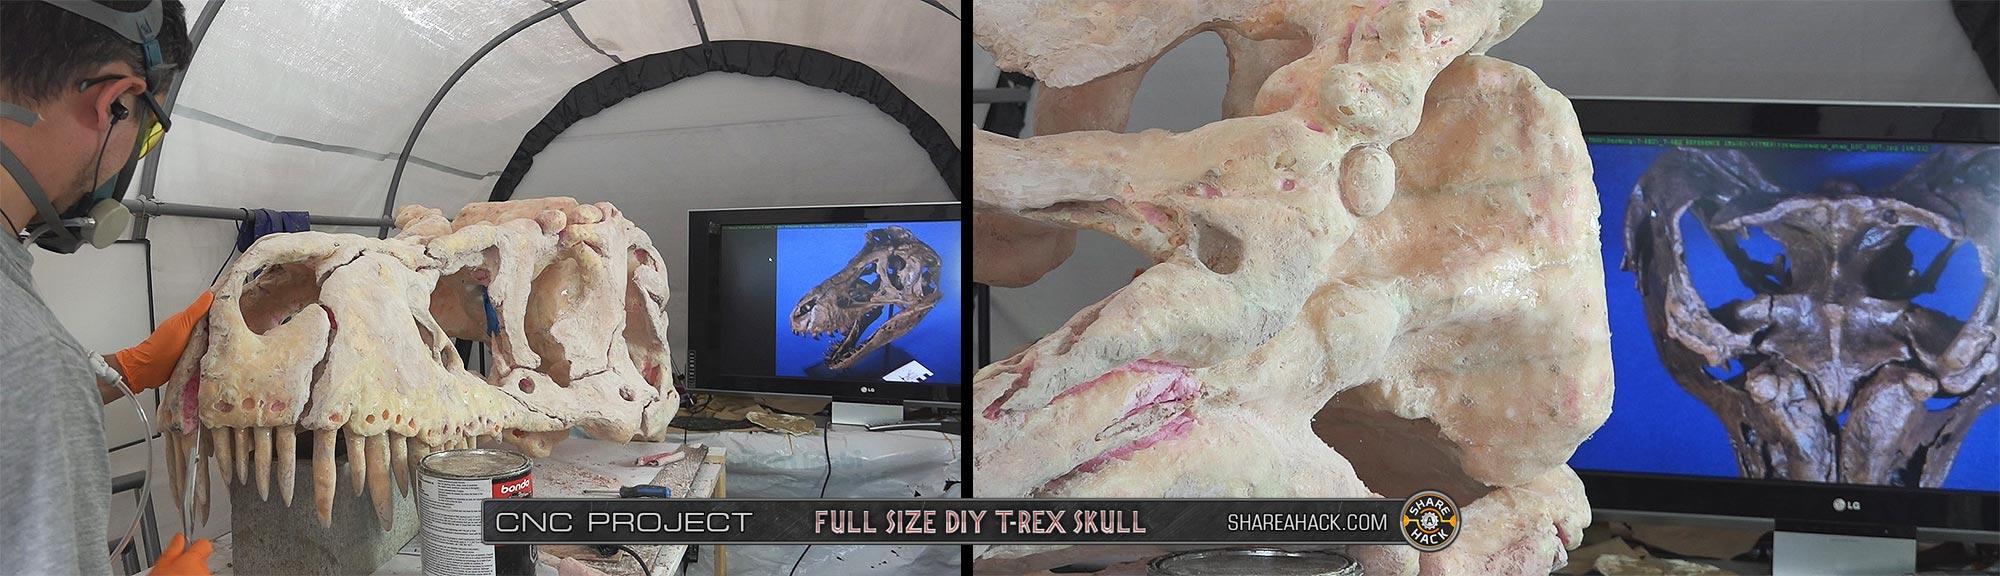 x-skull-cnc-foam_3dmodel_42-real-trex-fossil-skull.jpg